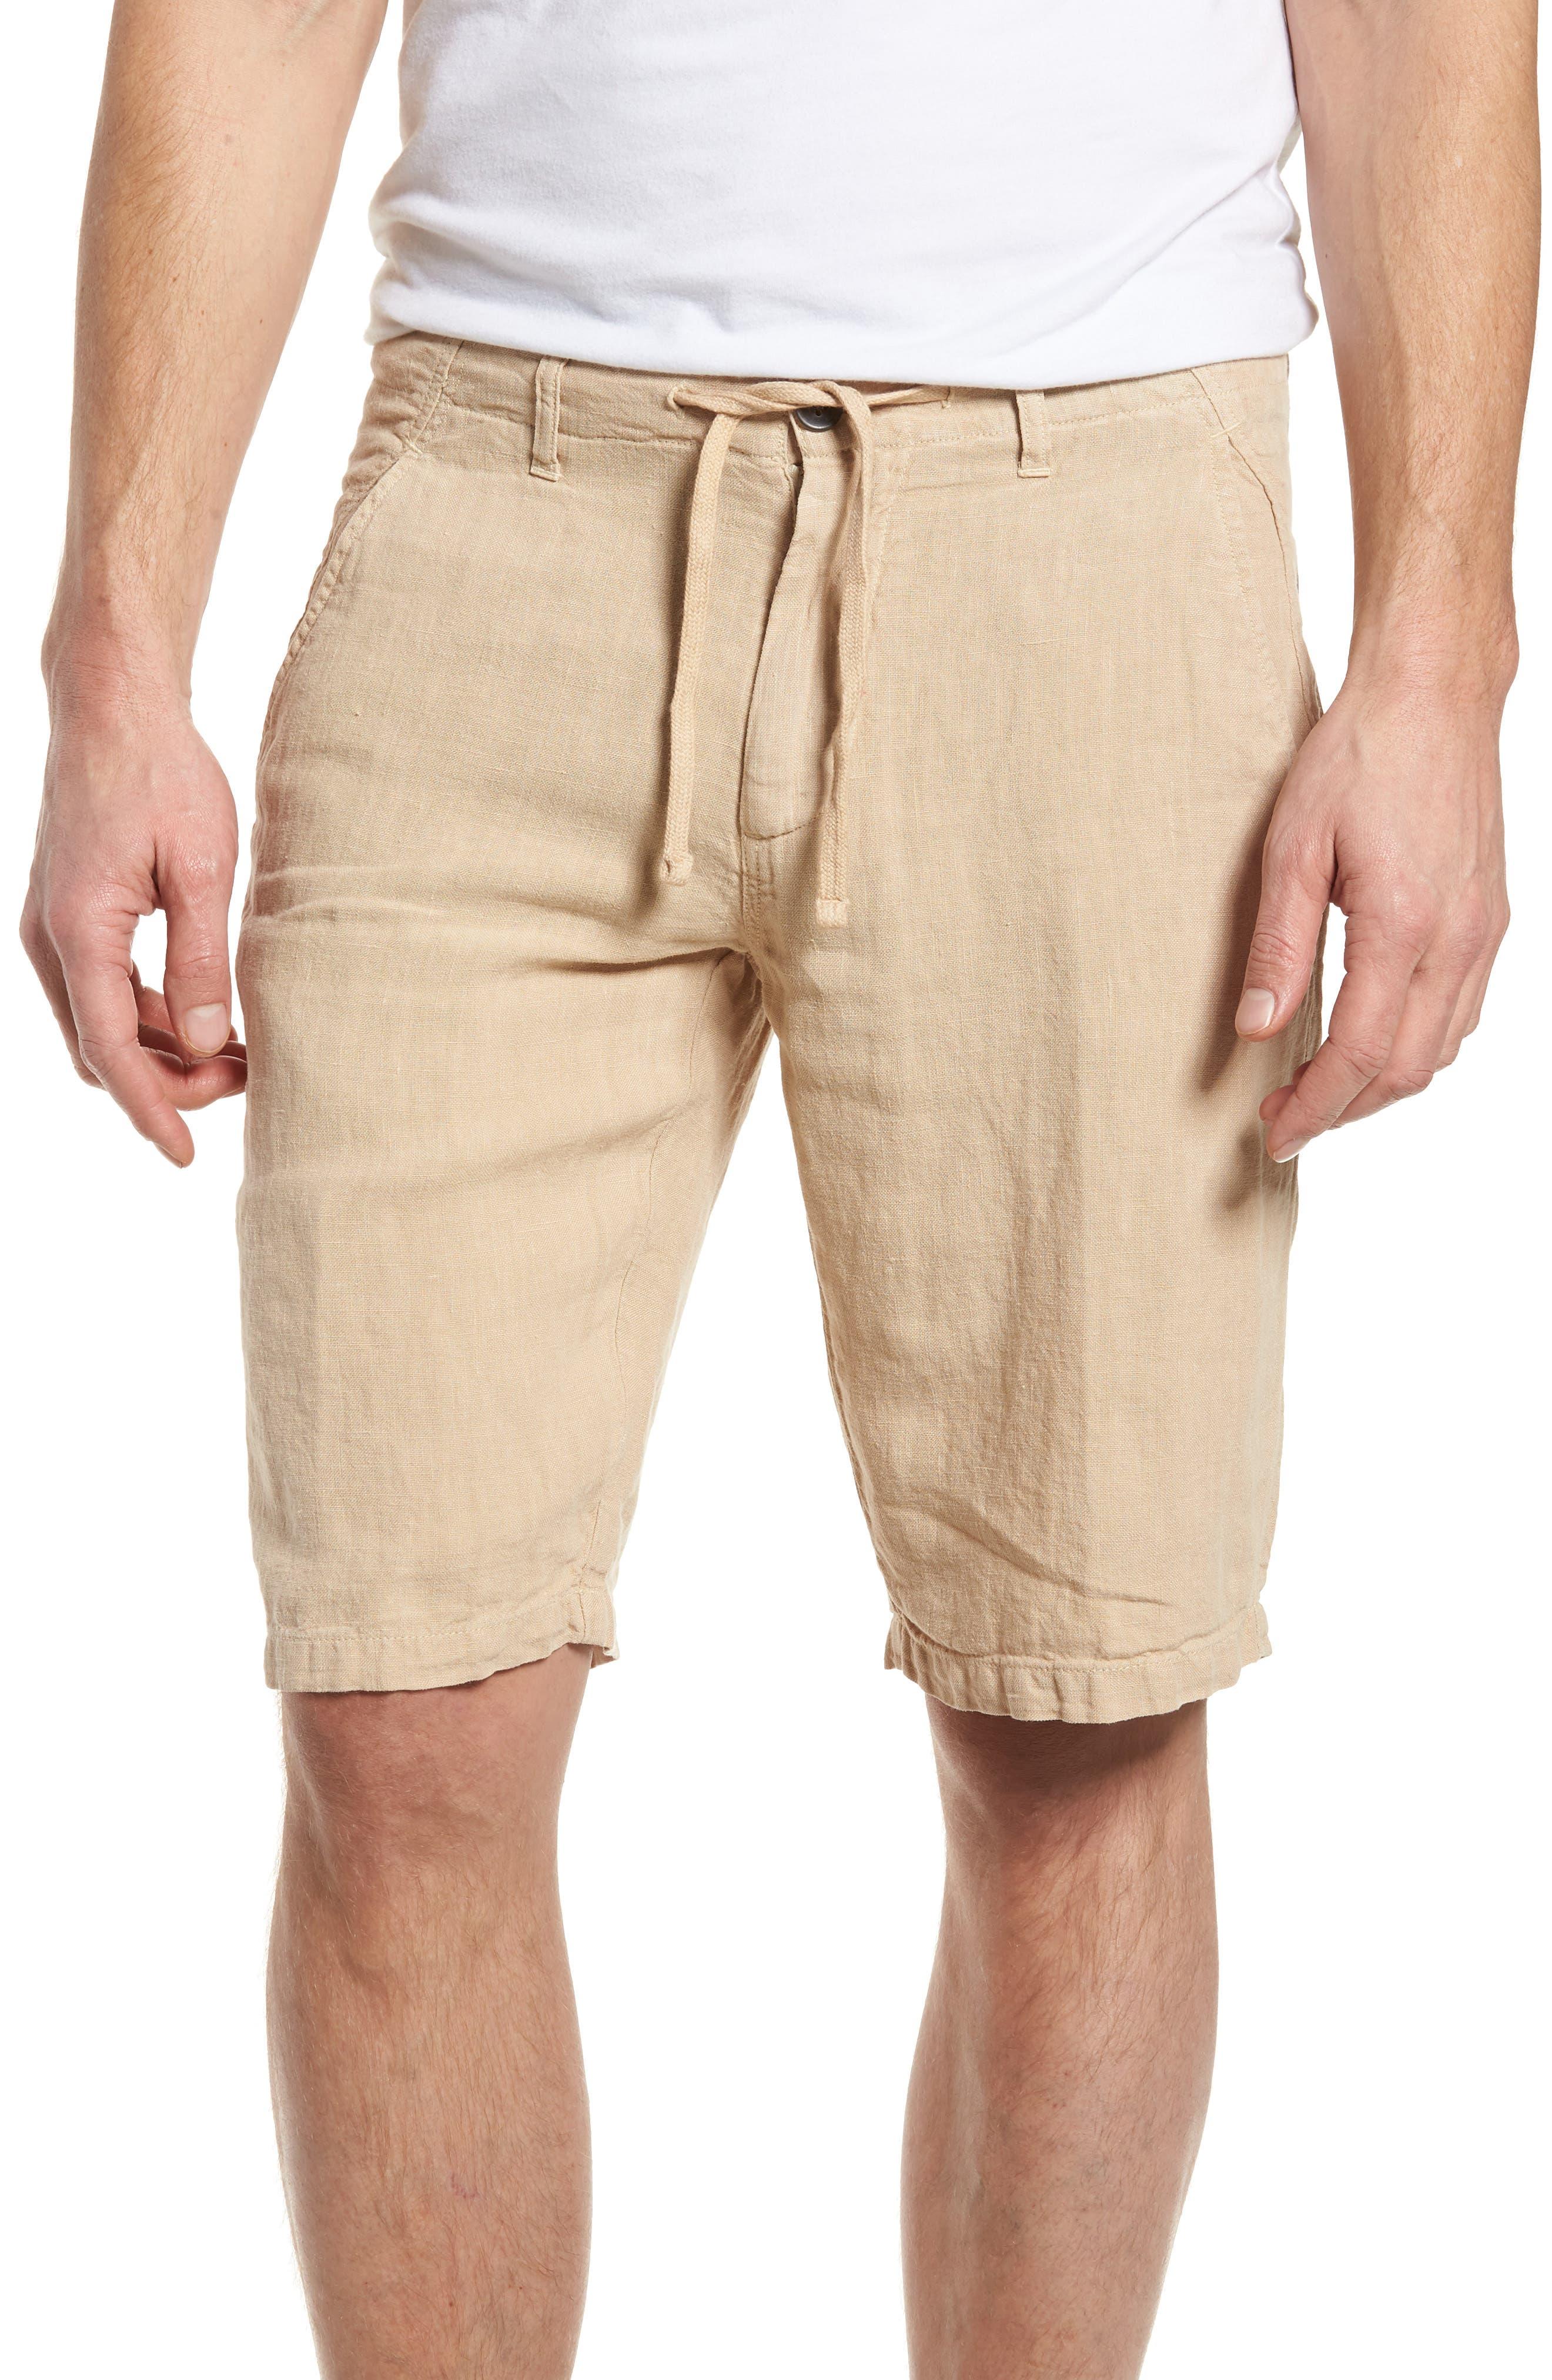 & Bros. Linen Shorts,                             Main thumbnail 1, color,                             Desert Dust